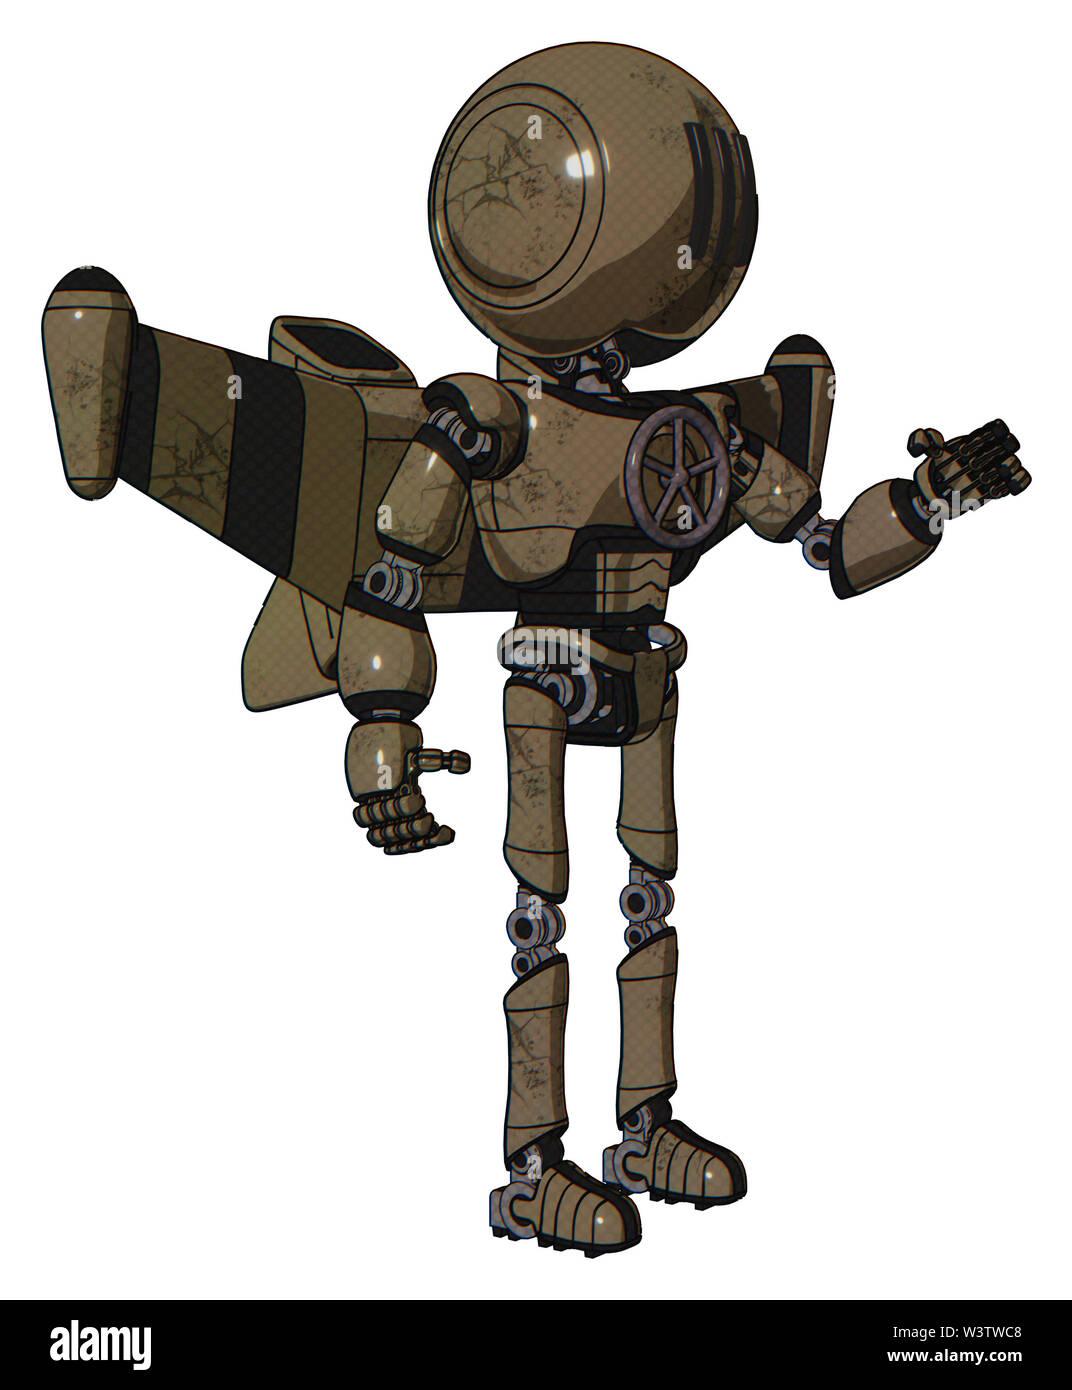 Bot containing elements: round head, three lens sentinel visor, light chest exoshielding, chest valve crank, stellar jet wing rocket pack, ultralight - Stock Image